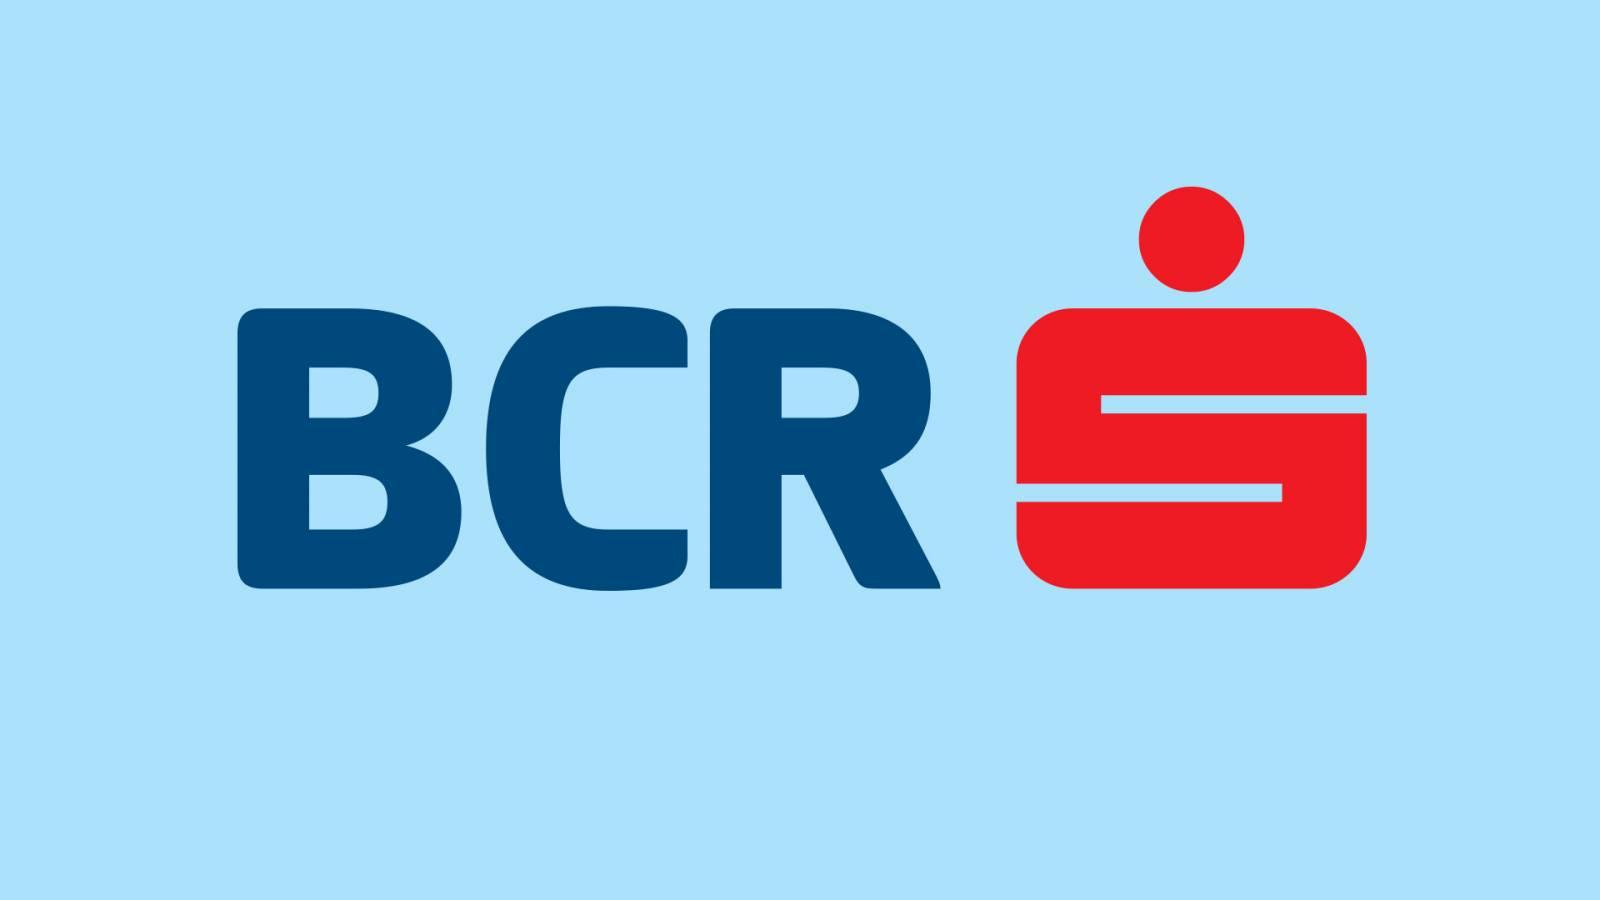 BCR Romania moneyback